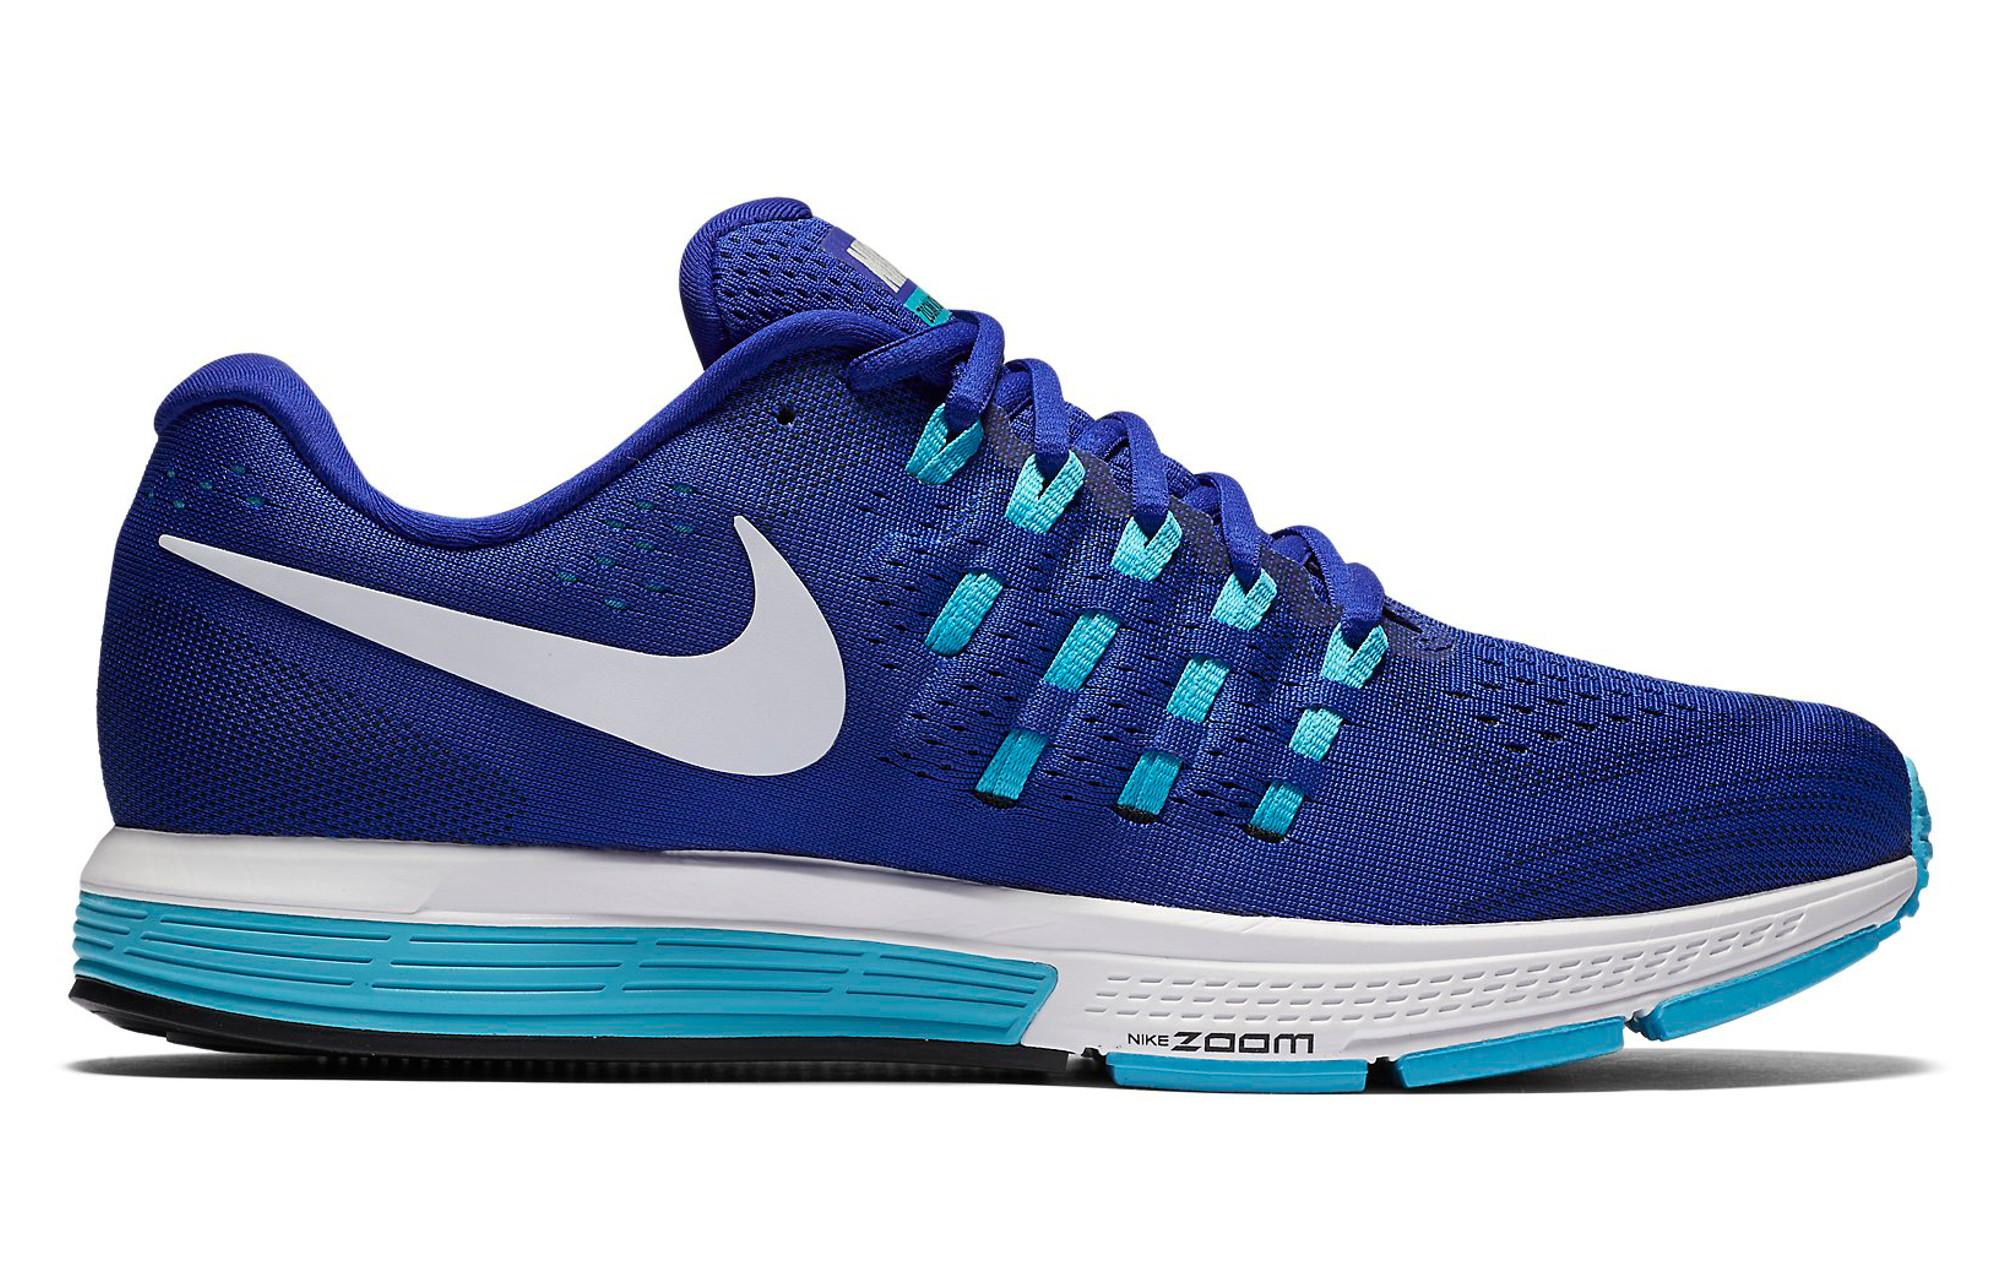 finest selection 55101 caa37 Zapatillas Nike AIR ZOOM VOMERO 11 para Hombre